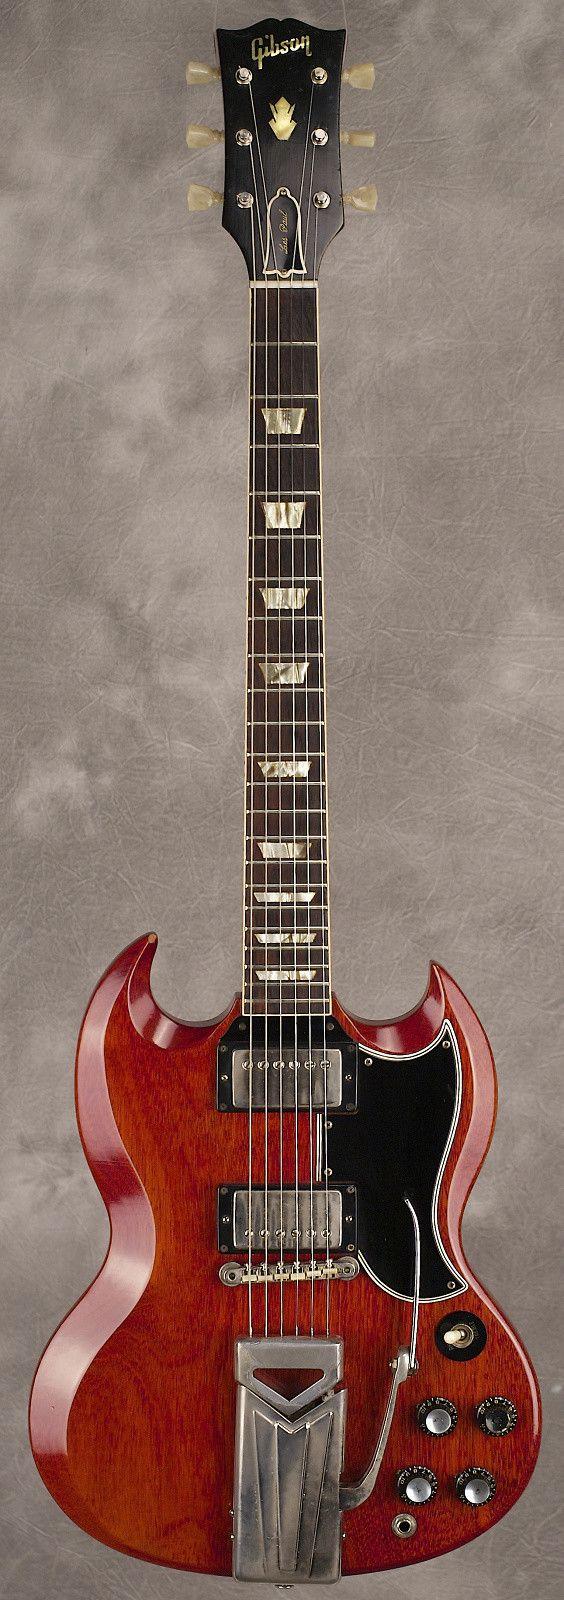 Gibson SG Standard Cherry (1962) #gibsonguitars